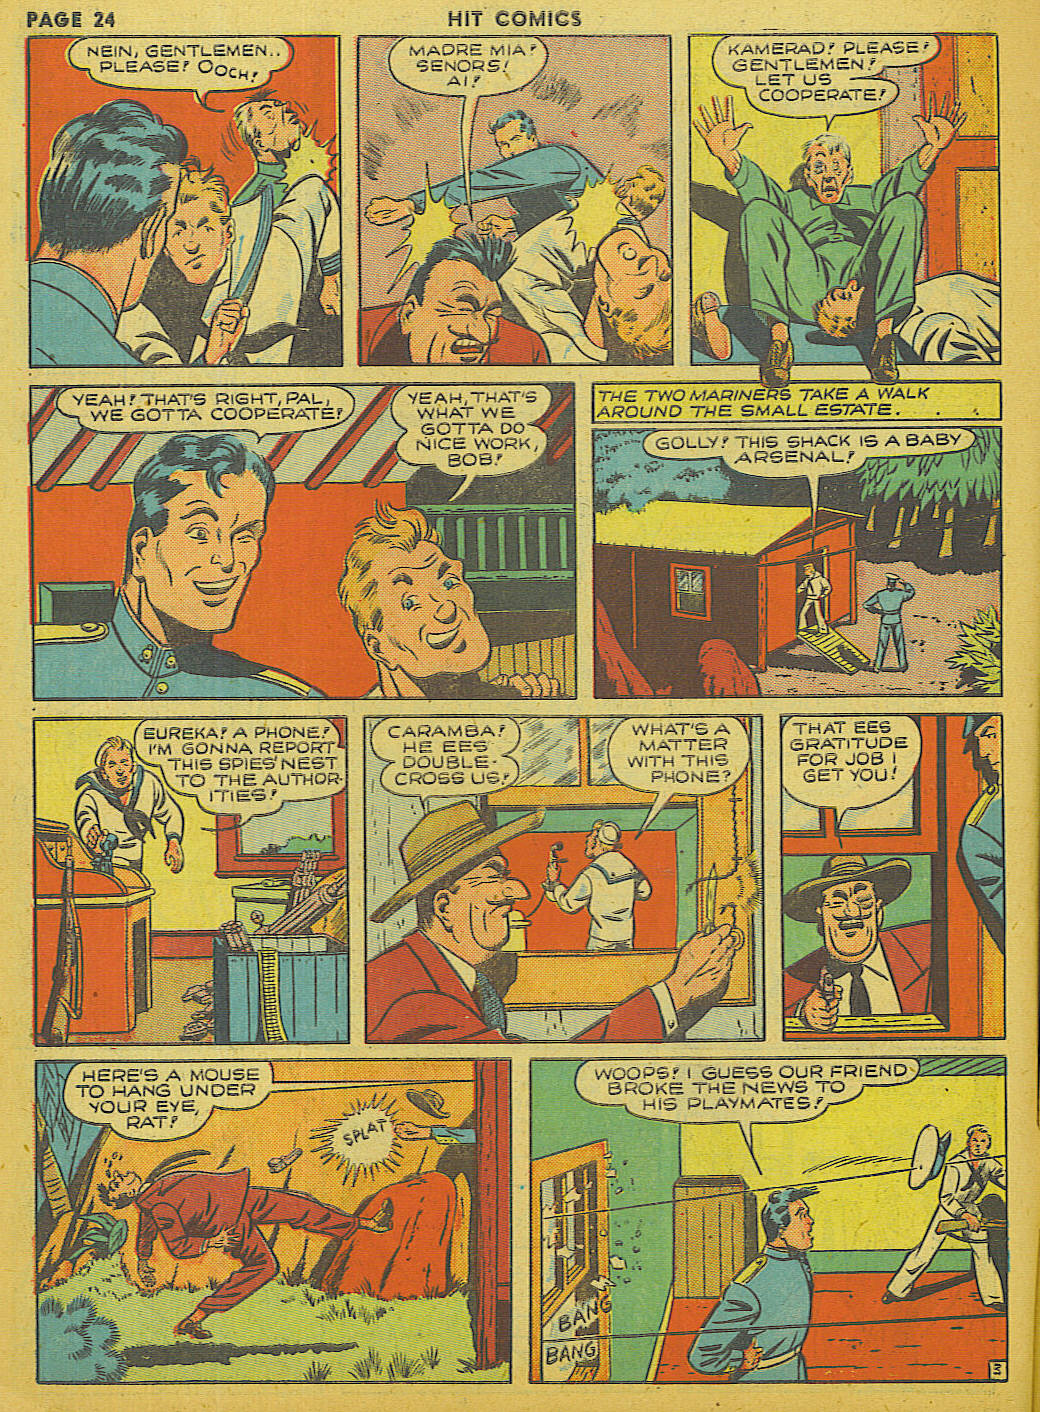 Read online Hit Comics comic -  Issue #13 - 26